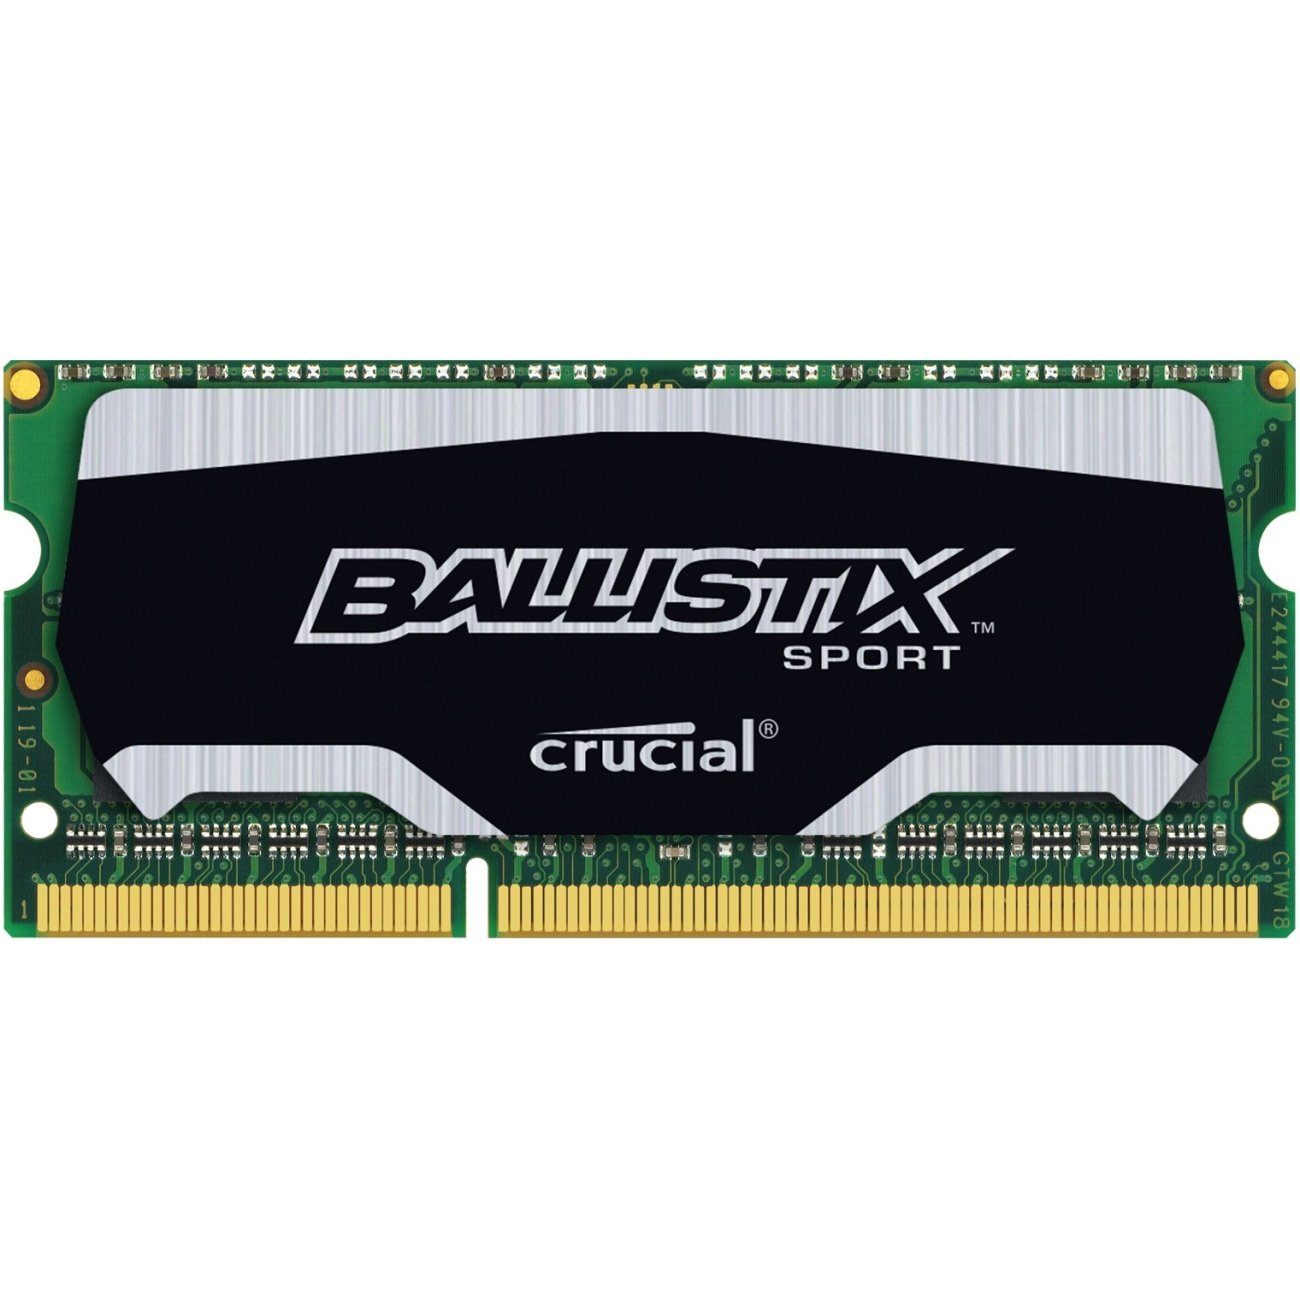 Ballistix Sport 8GB Single DDR3 1866 MT/s (PC3-12800) SODIMM 204-Pin Memory - BLS8G3N18AES4 by Ballistix